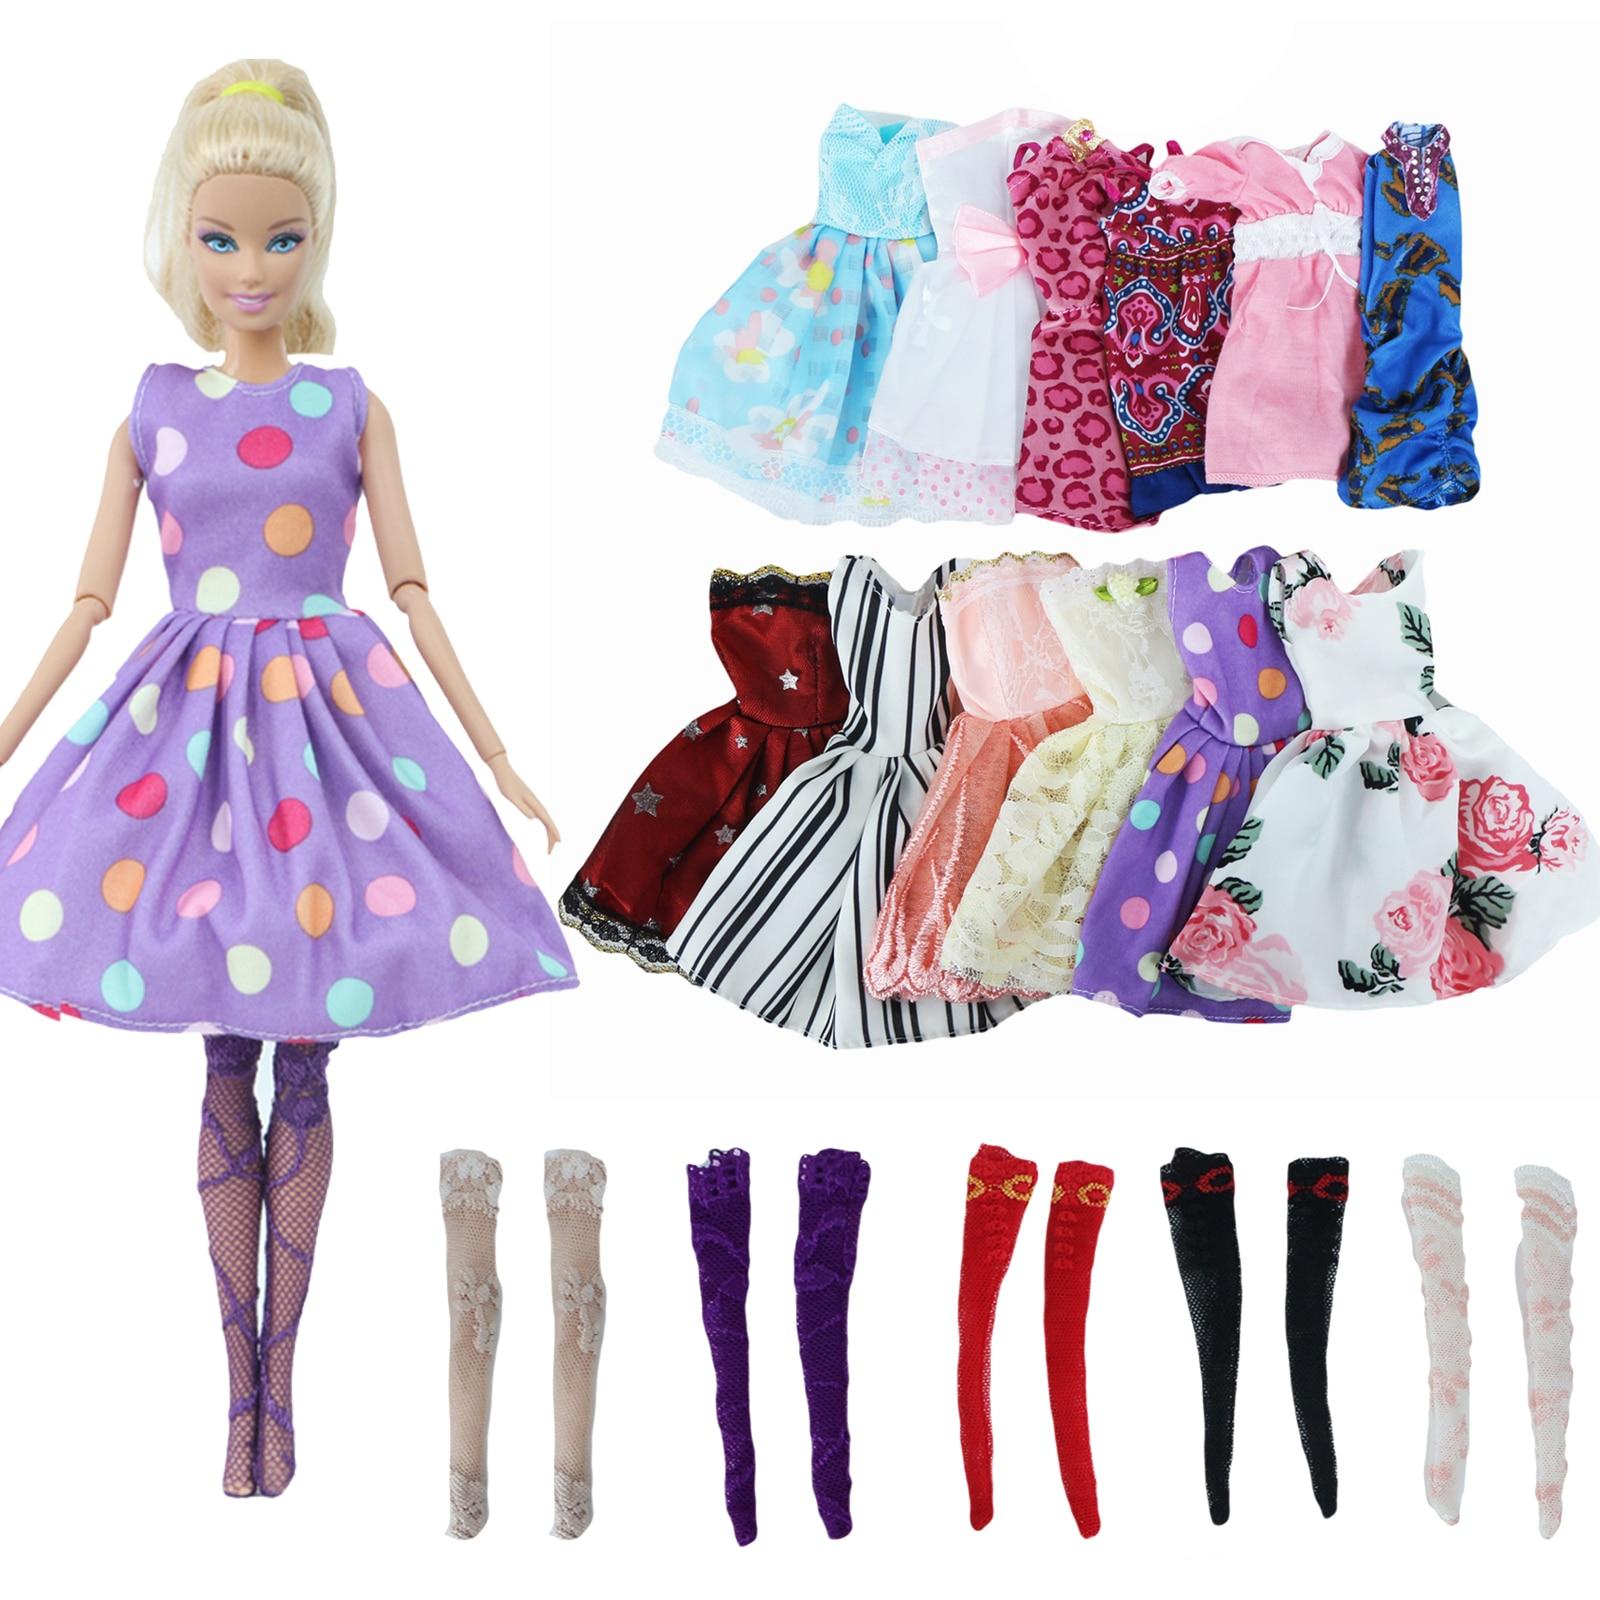 3 Pieces Random Color Doll Clothes Bathrobe for 30 cm Doll